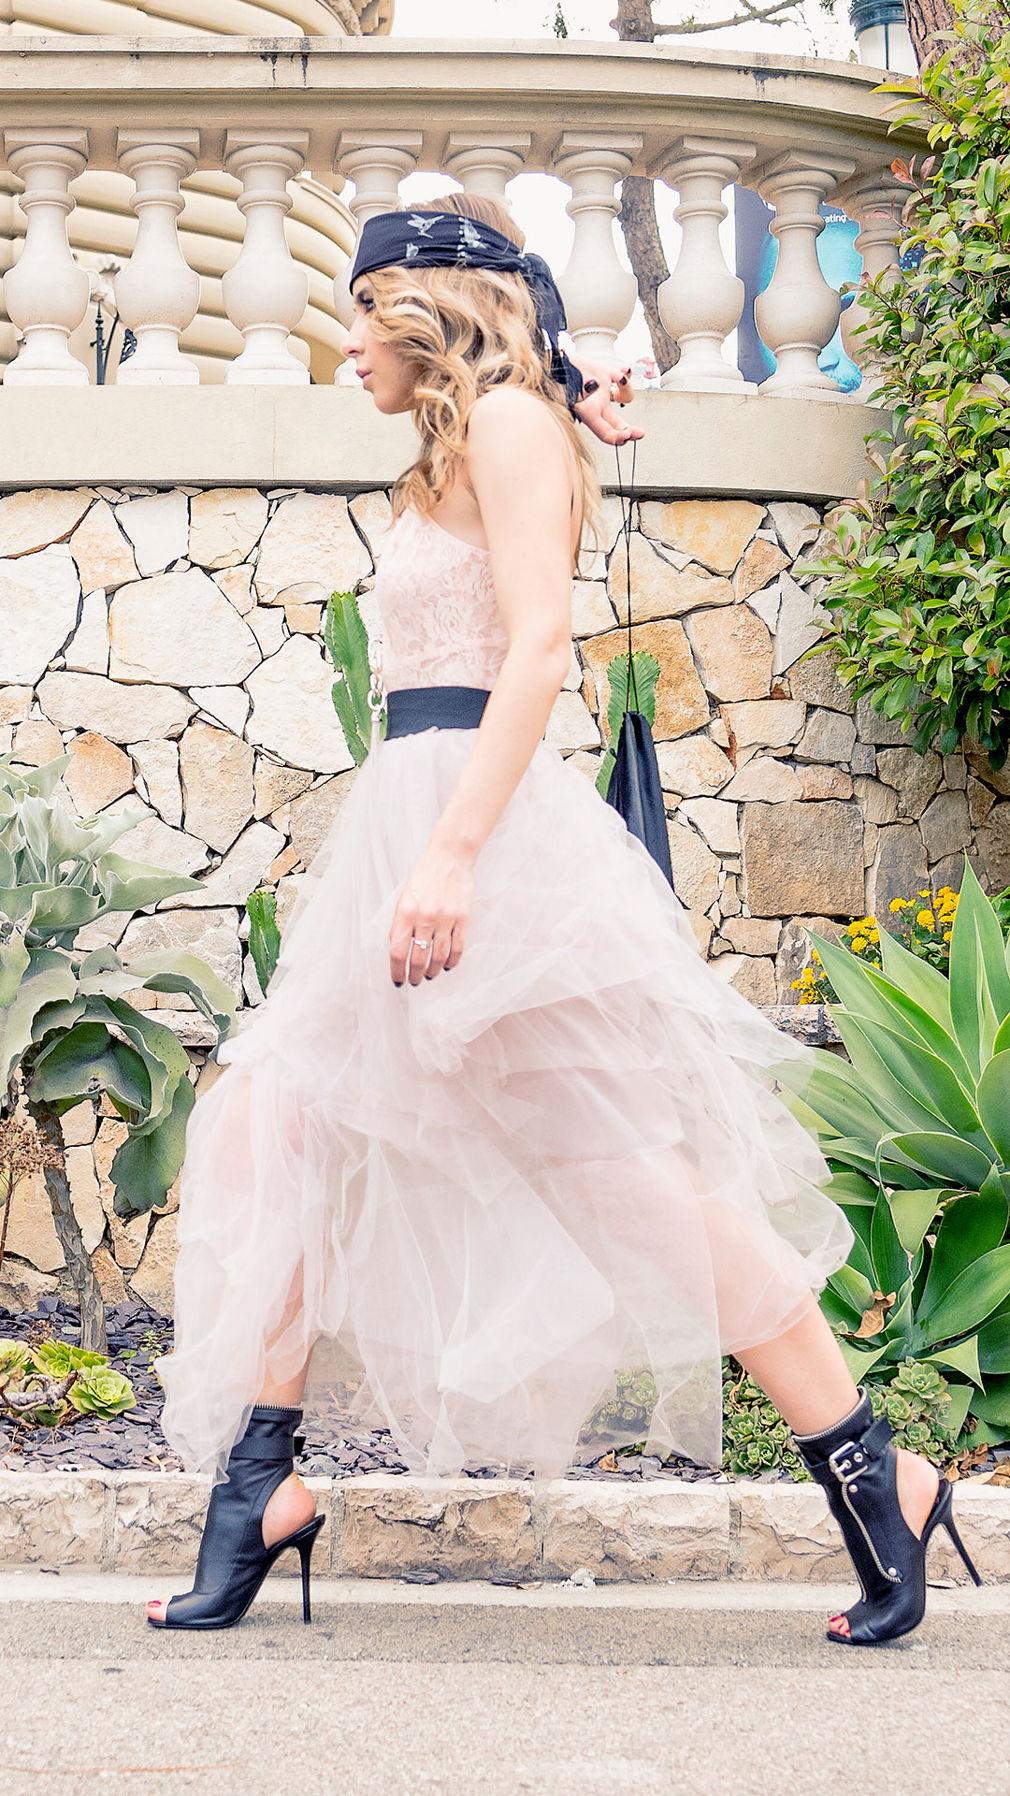 Glam Rock Powder skirt